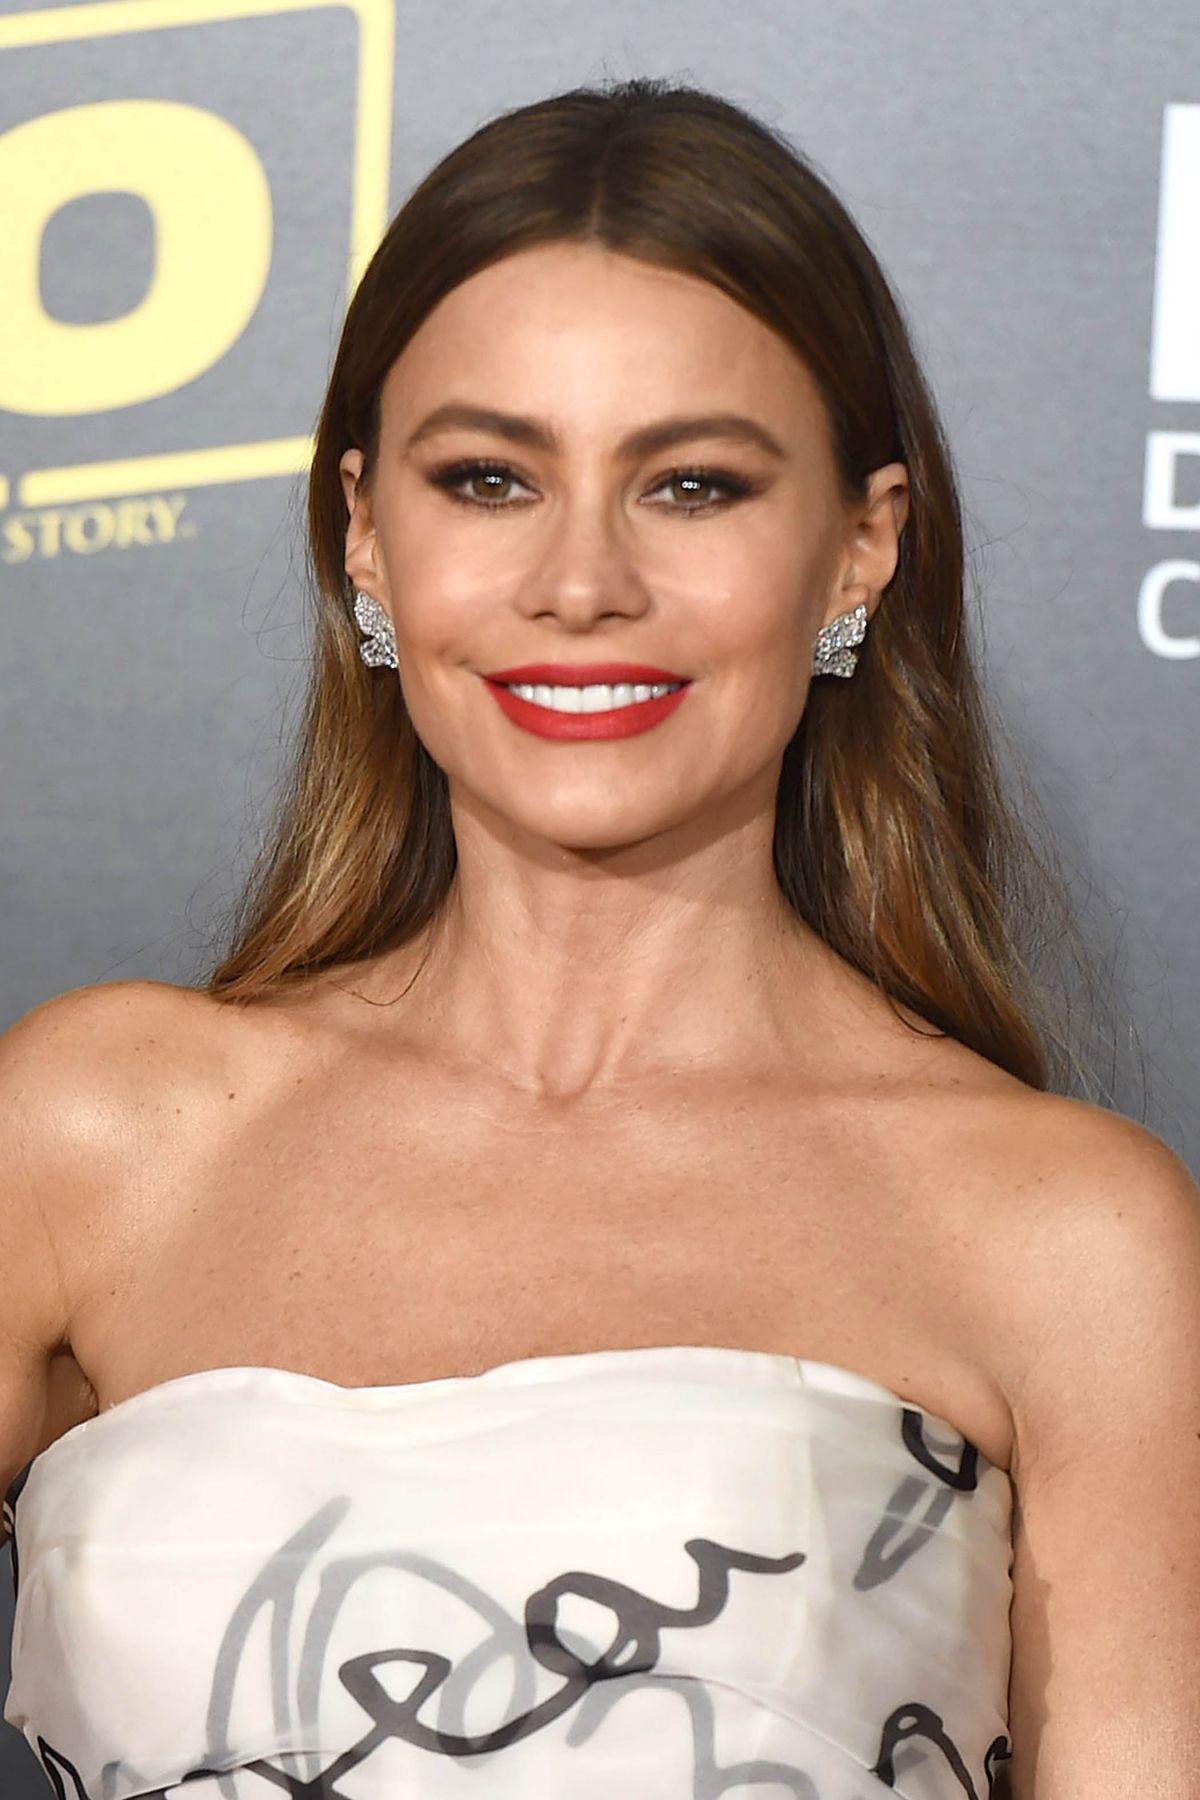 SOFIA VERGARA At Solo A Star Wars Story Premiere In Los